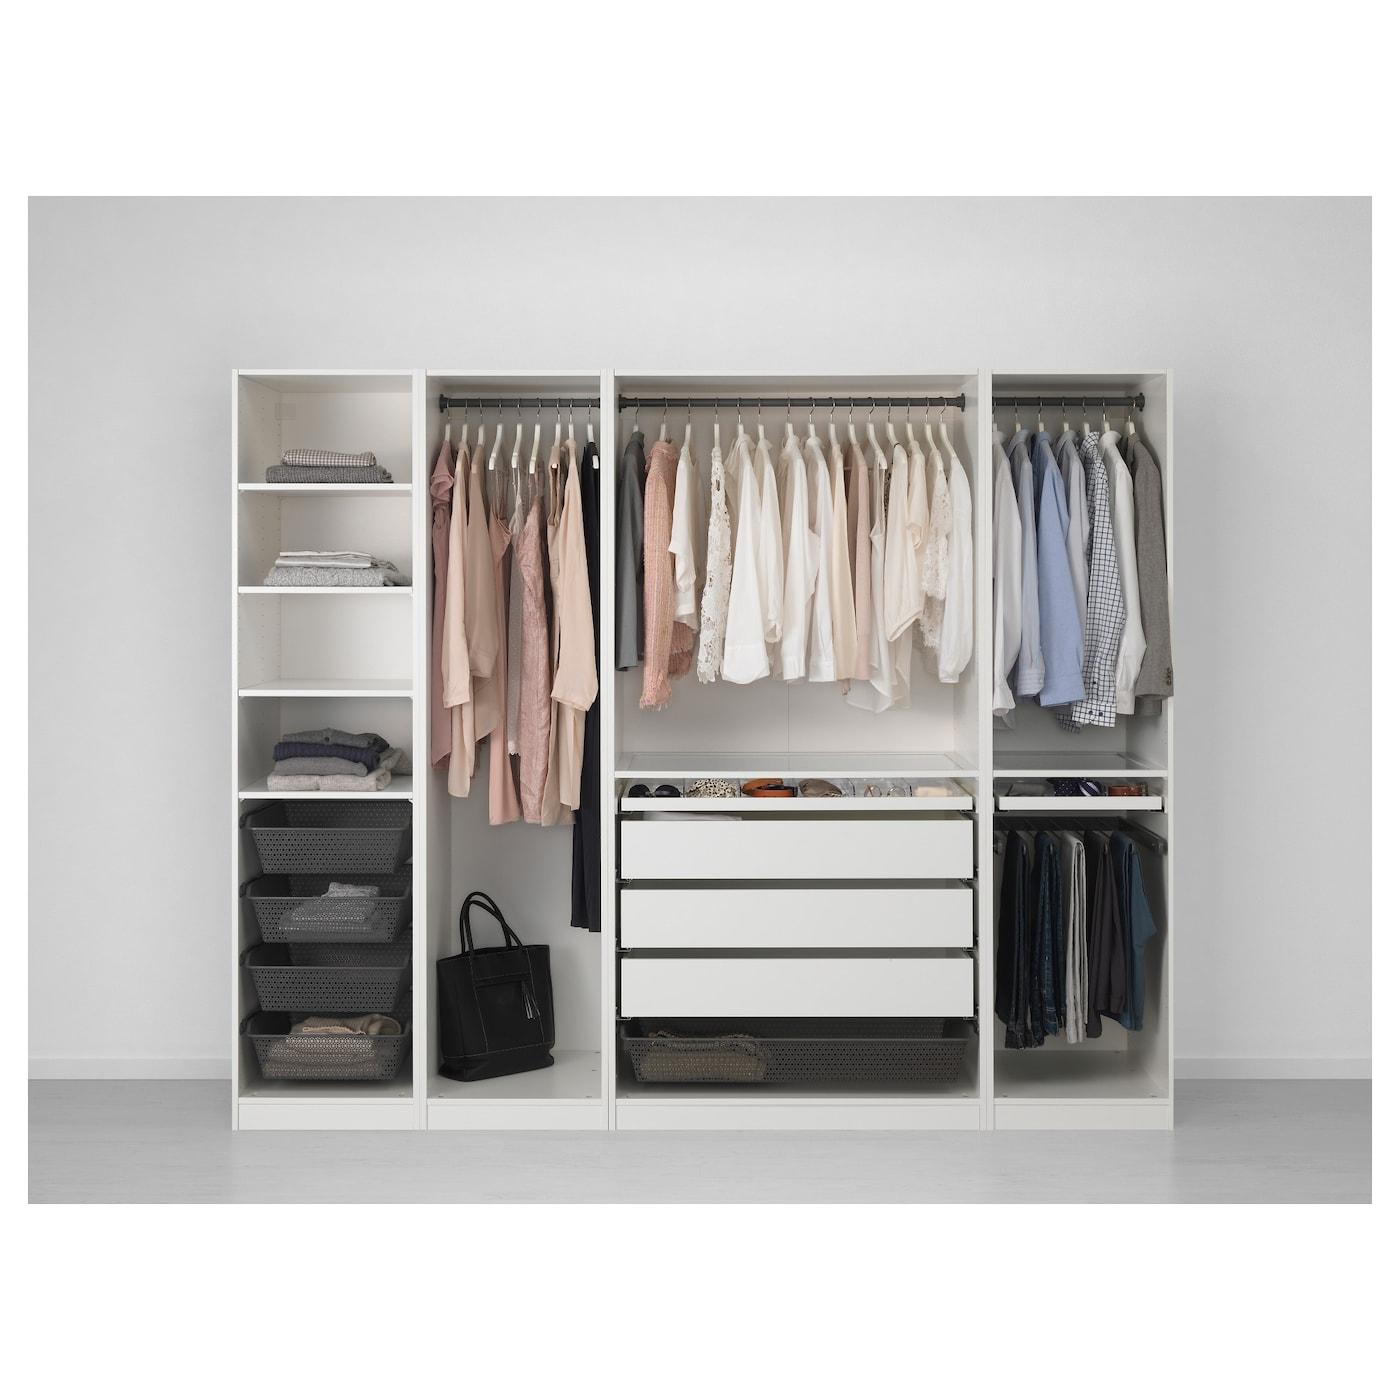 PAX Wardrobe White 250x58x201 Cm